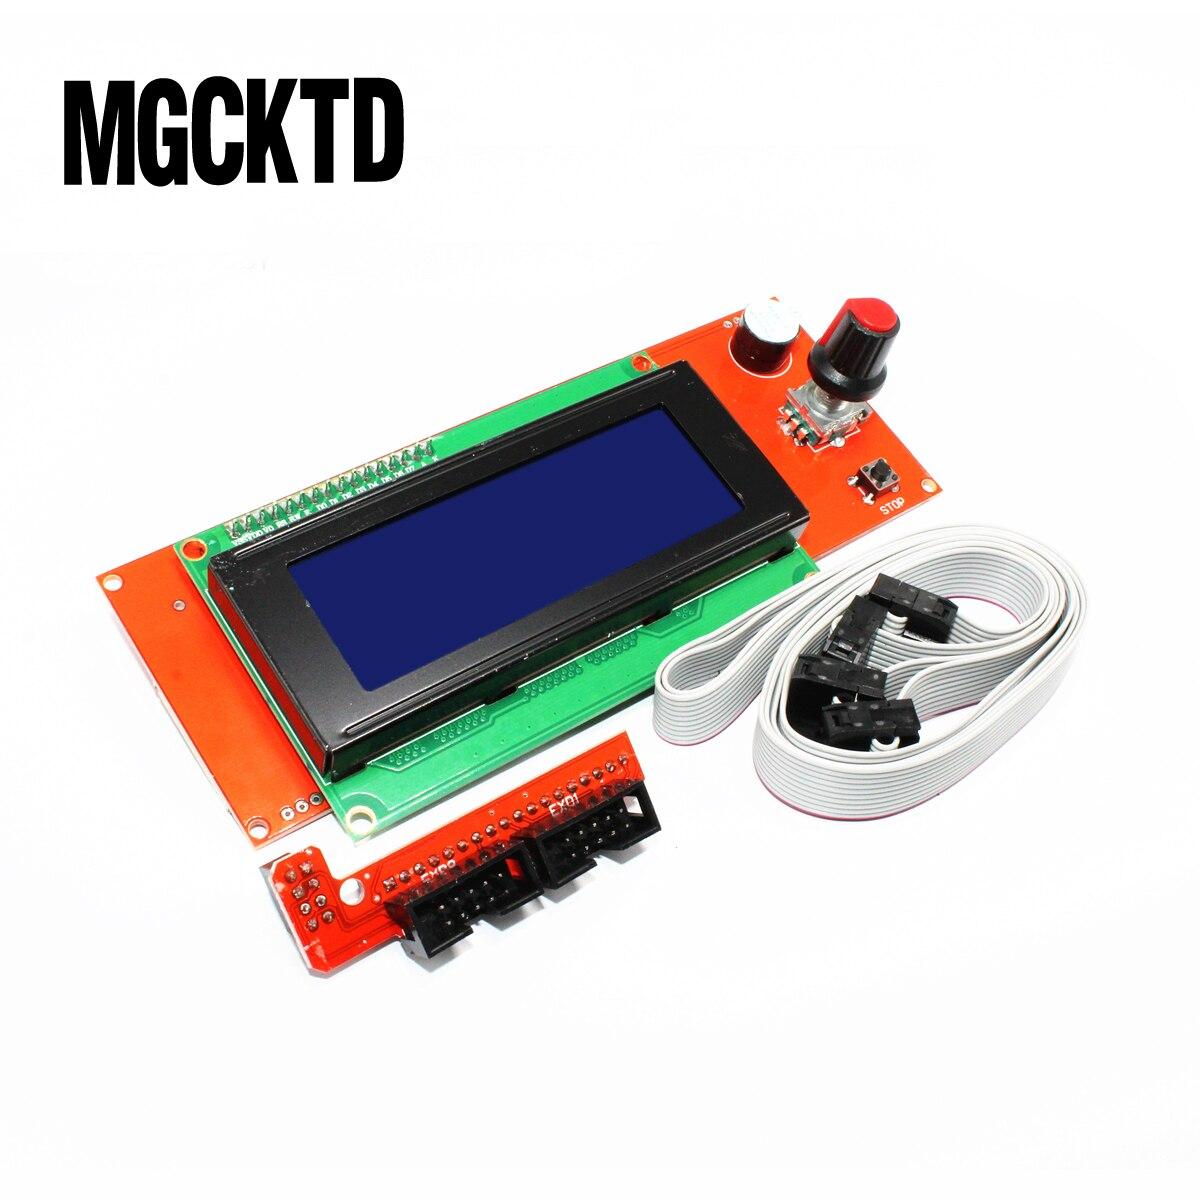 Novos produtos 2004 LCD Módulo de Controle para Impressora Reprap Controlador Smart Rampas 1.4 FZ590 3D Dropshipping